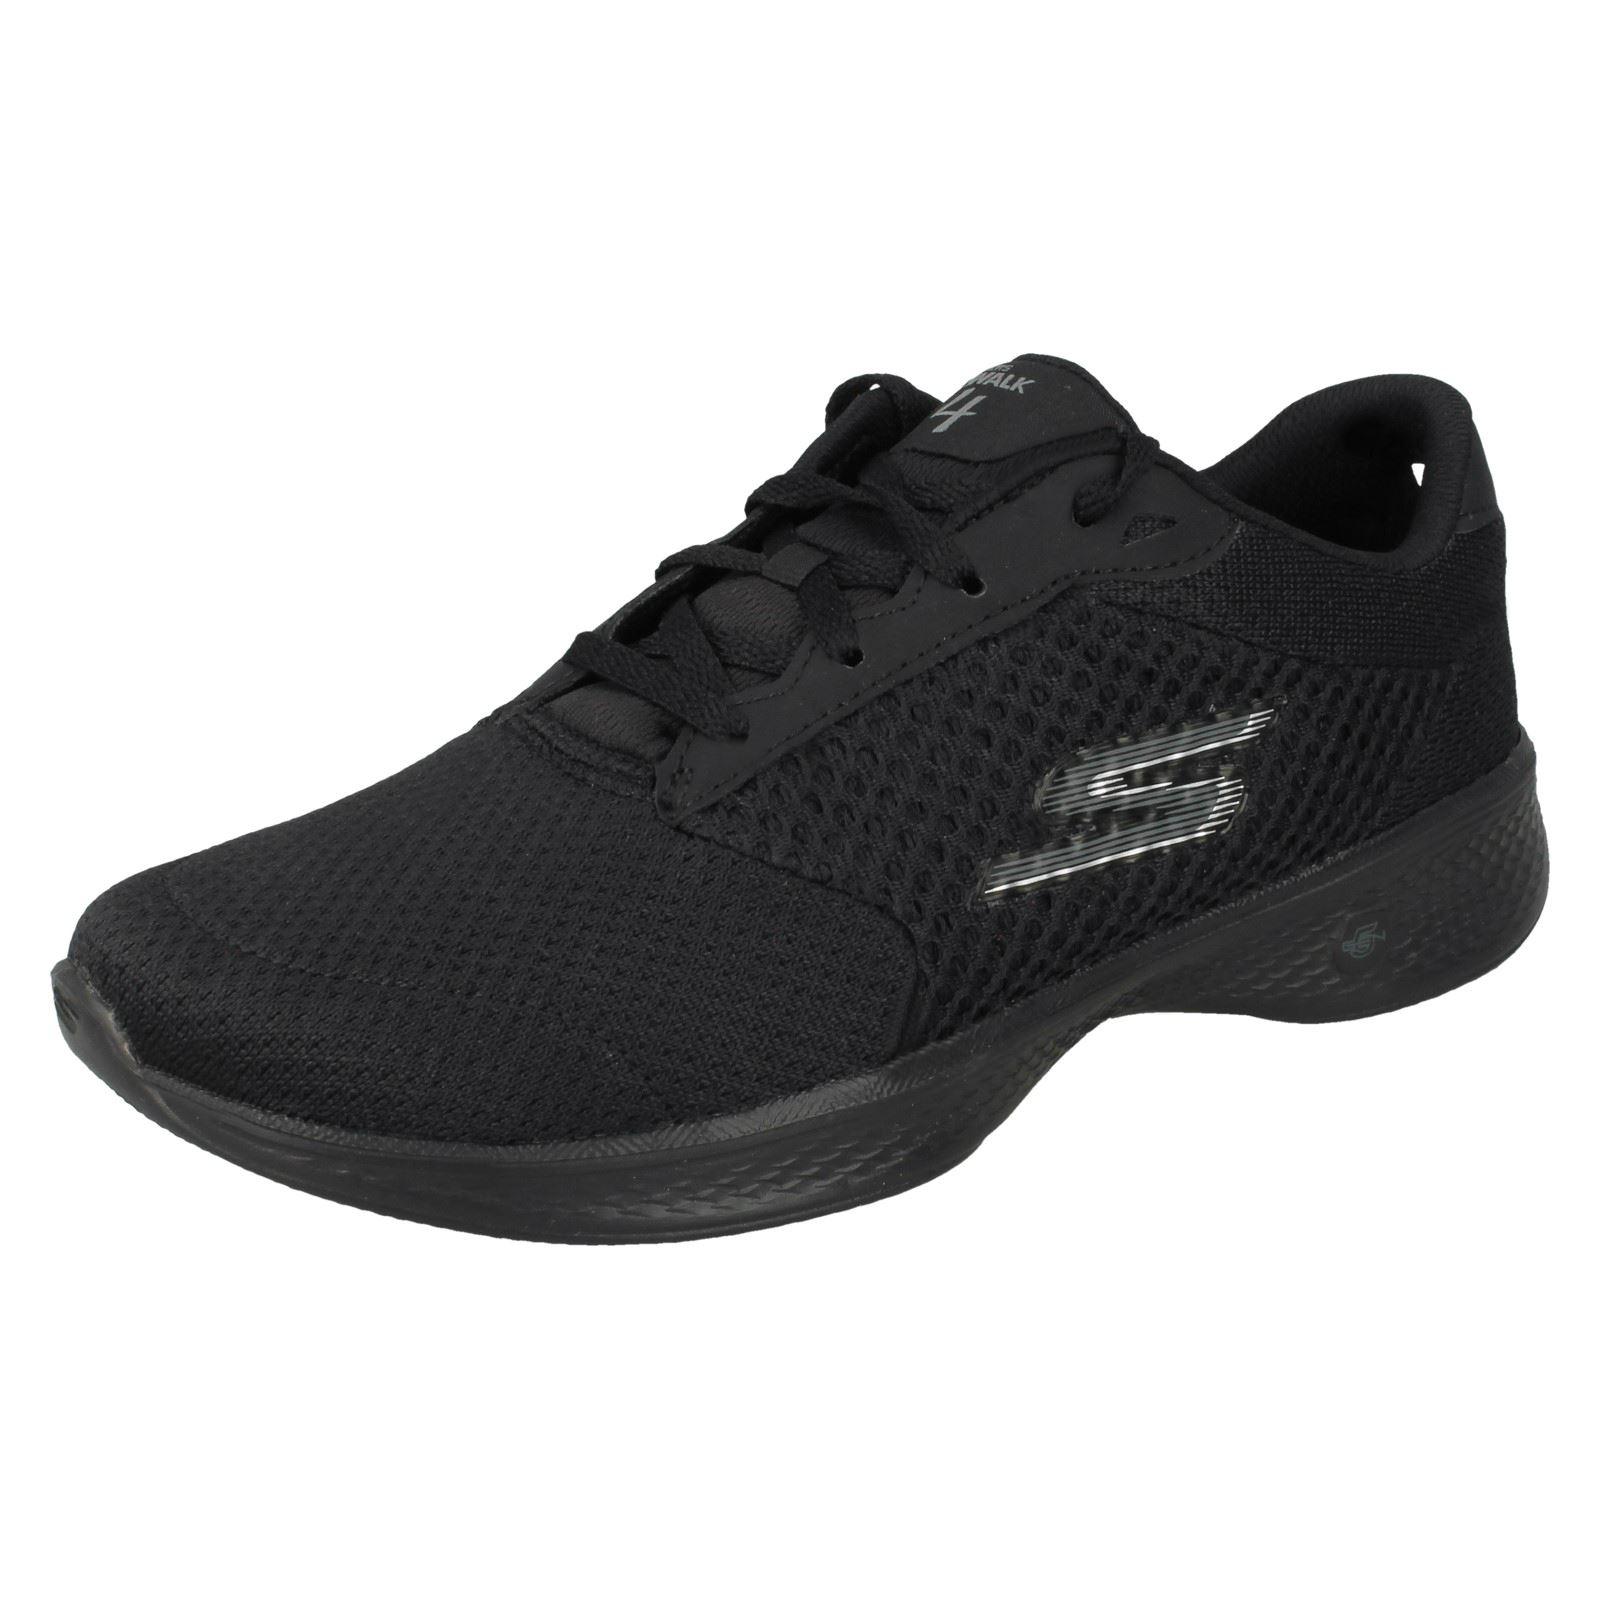 Donna Skechers's Sports Scarpe Da Ginnastica Go Go Go Walk 4 superare i 14146 - 871519